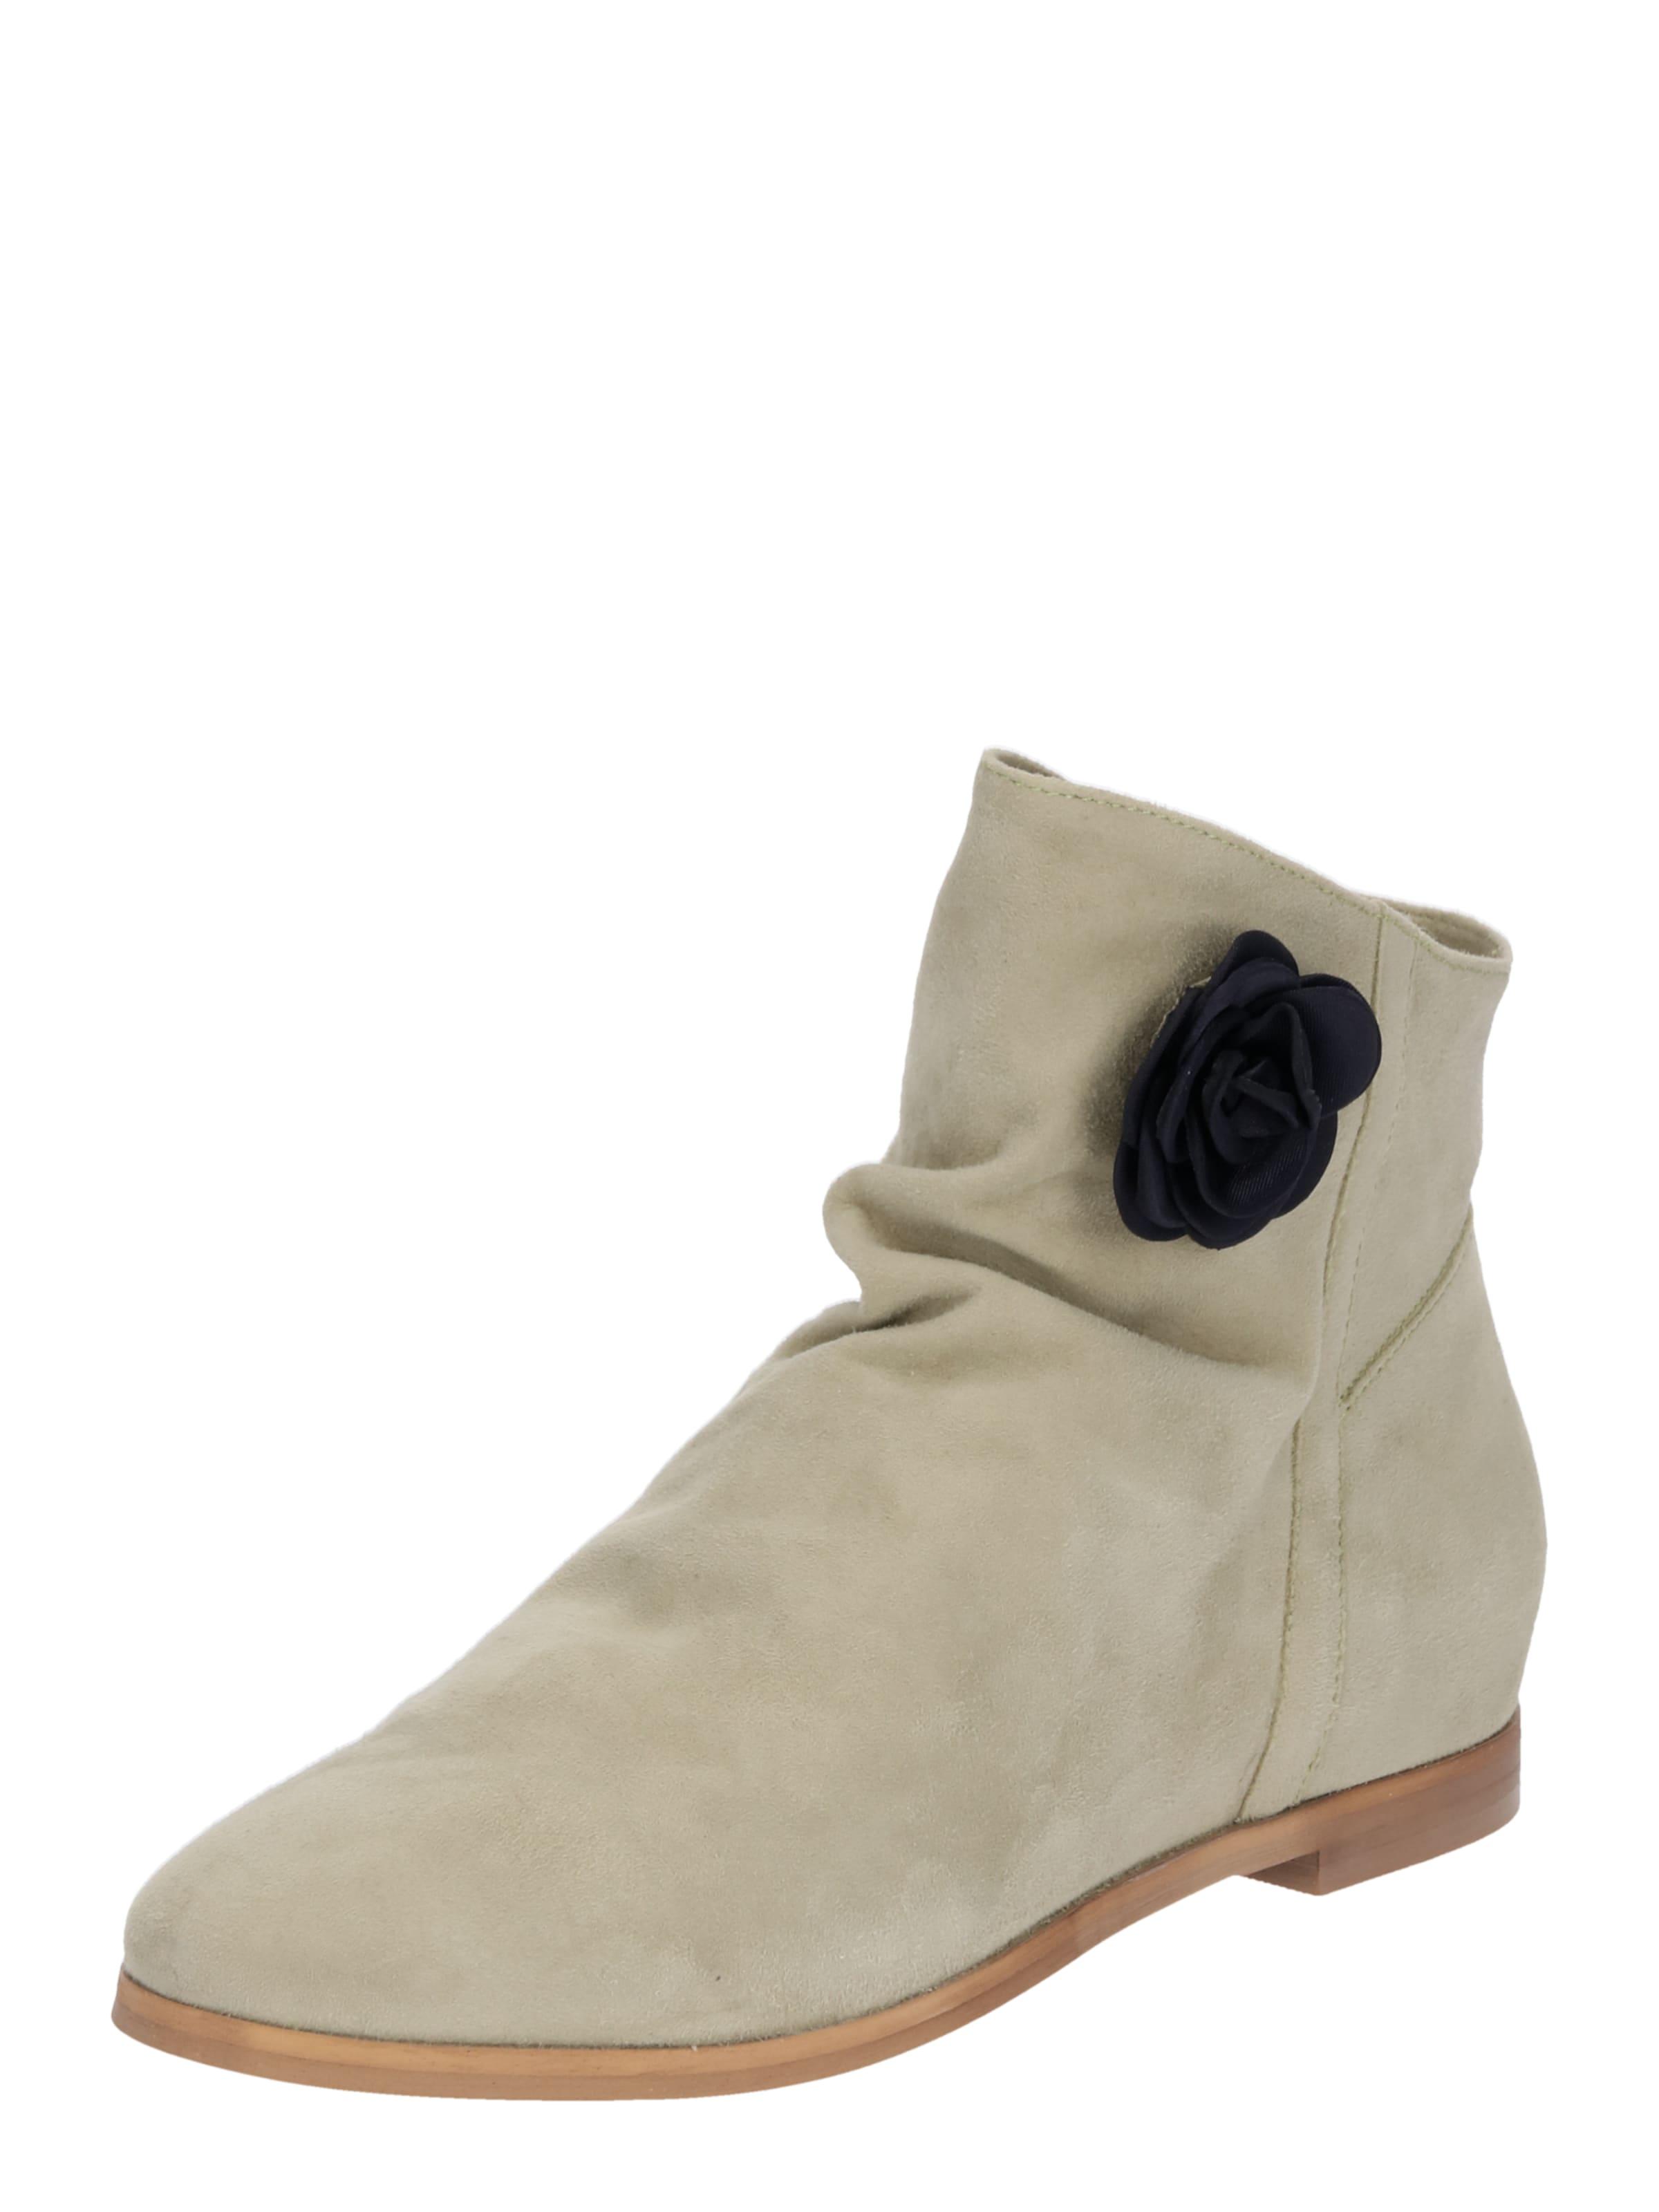 SPM Ankle Boots Yaylala Verschleißfeste billige Schuhe